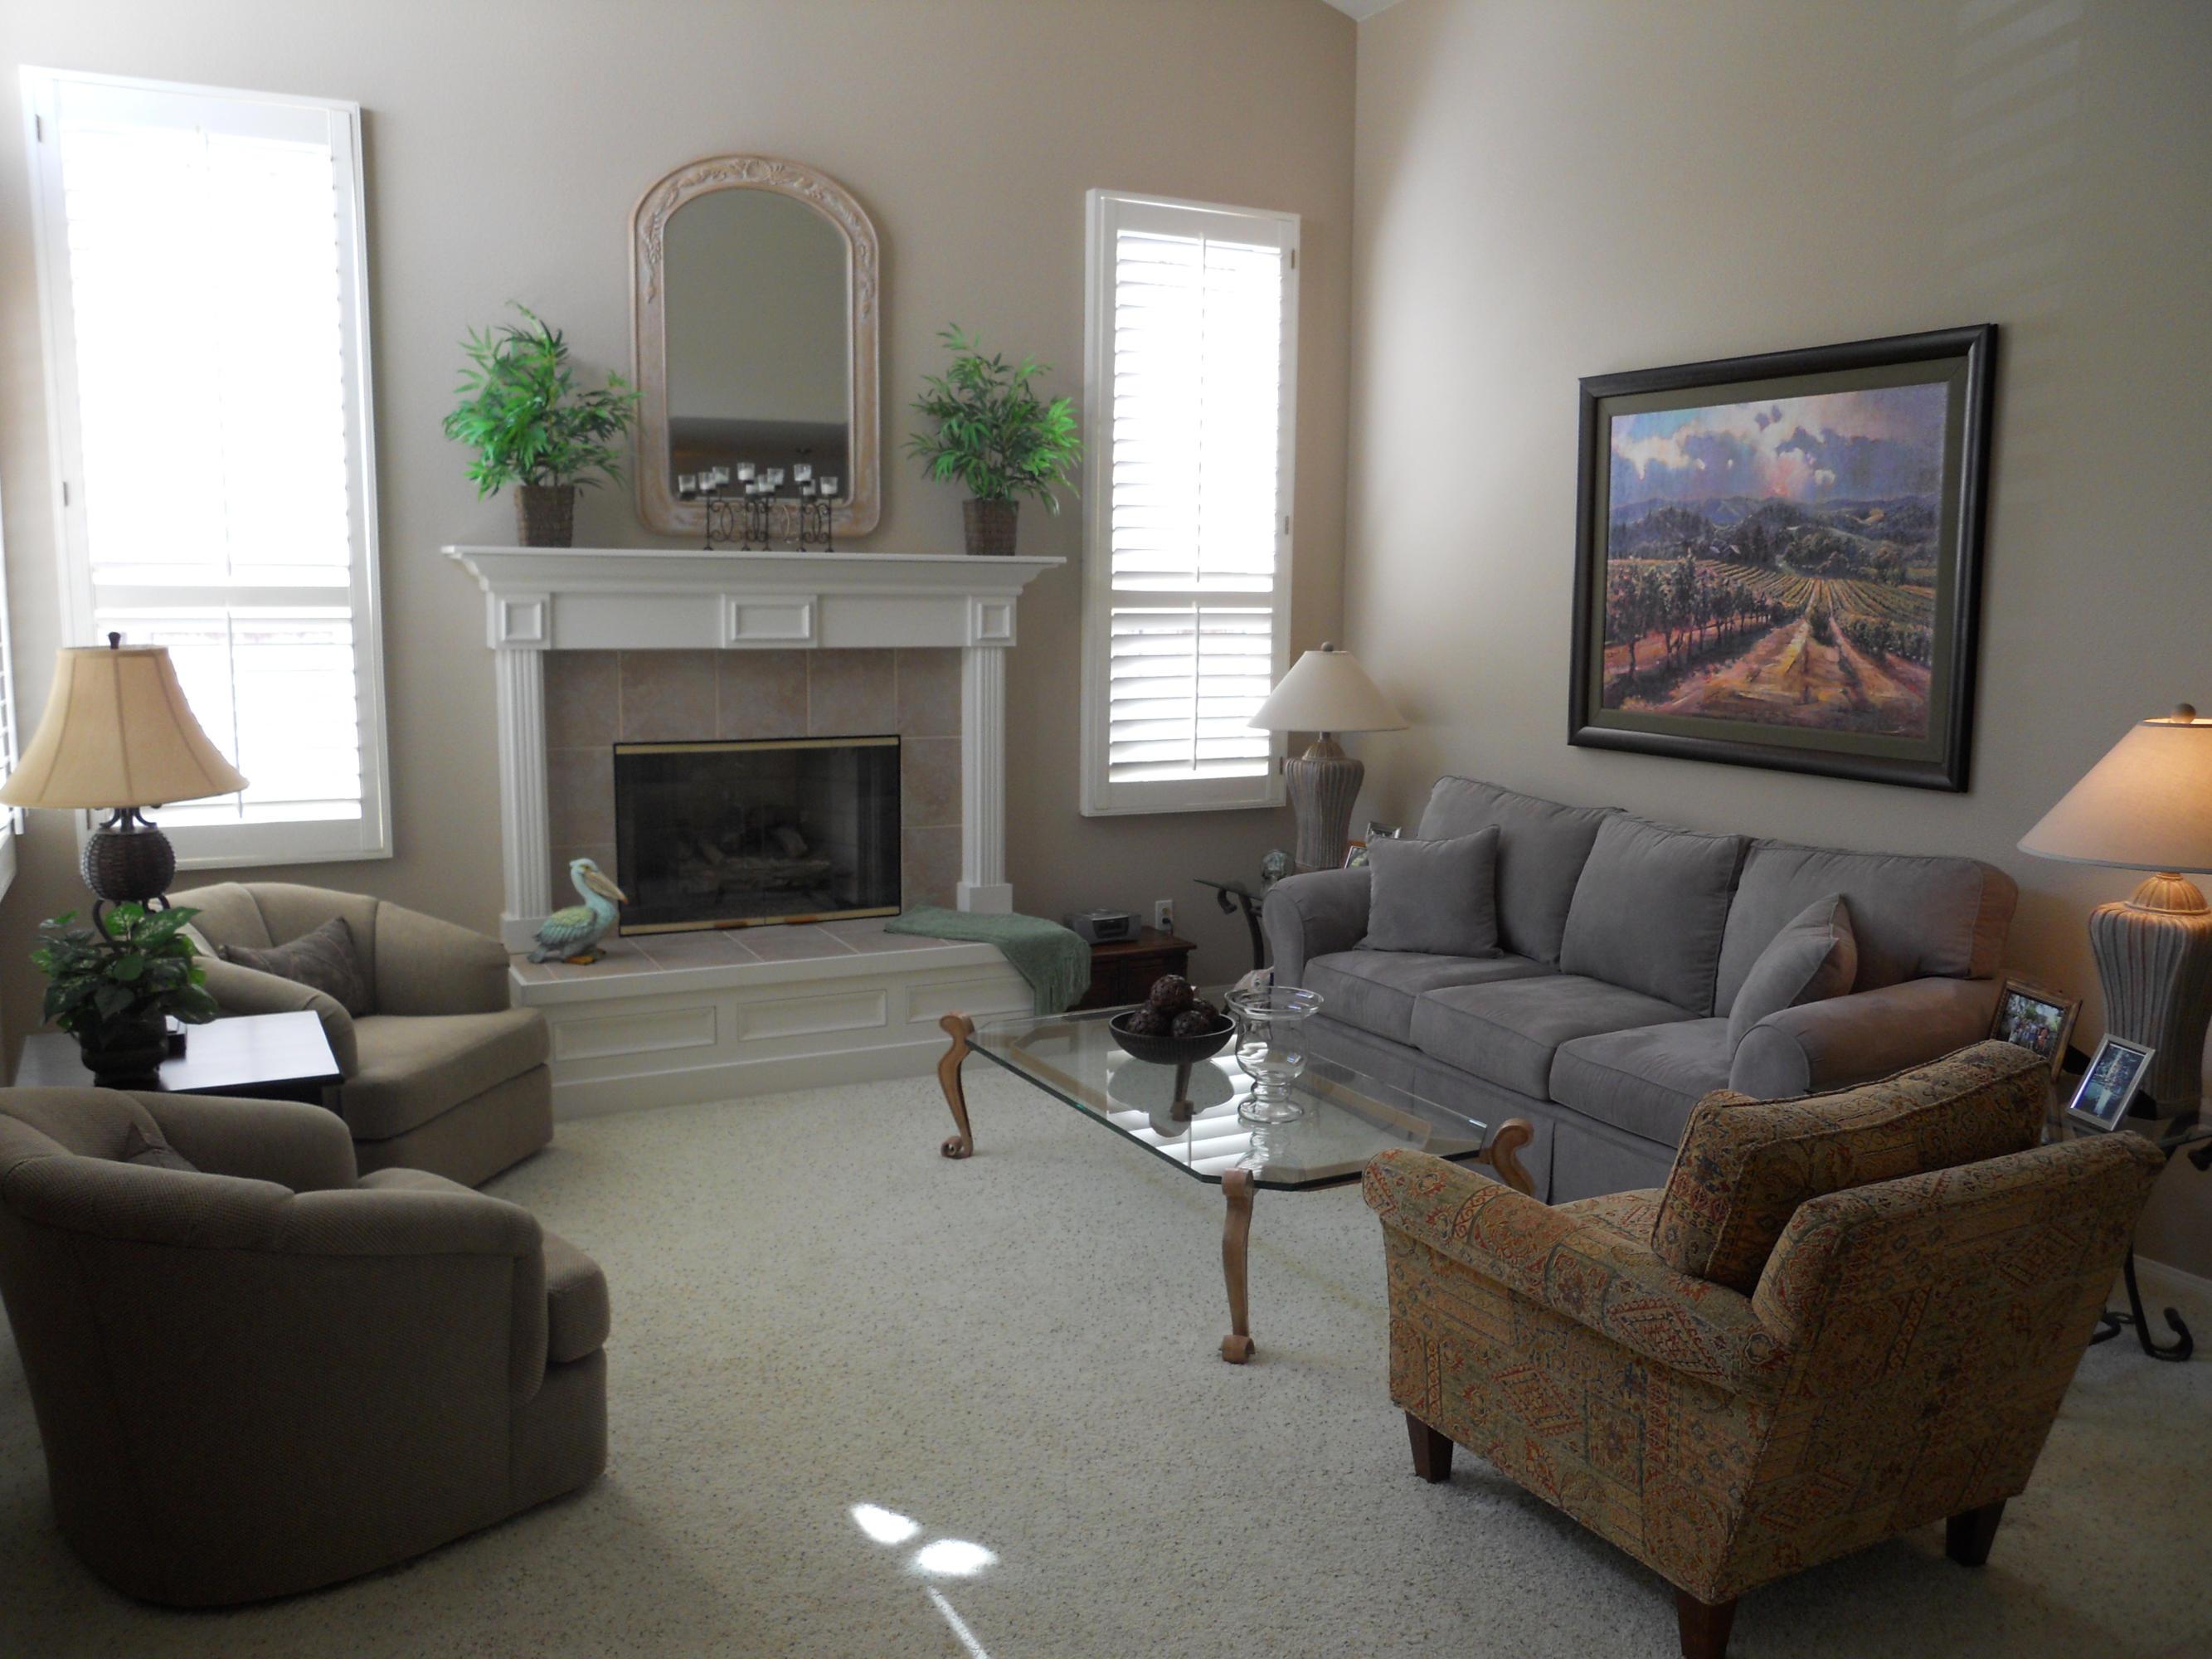 Property photo for 721 Cathedral Pointe Ln Santa Barbara, California 93111 - 14-786